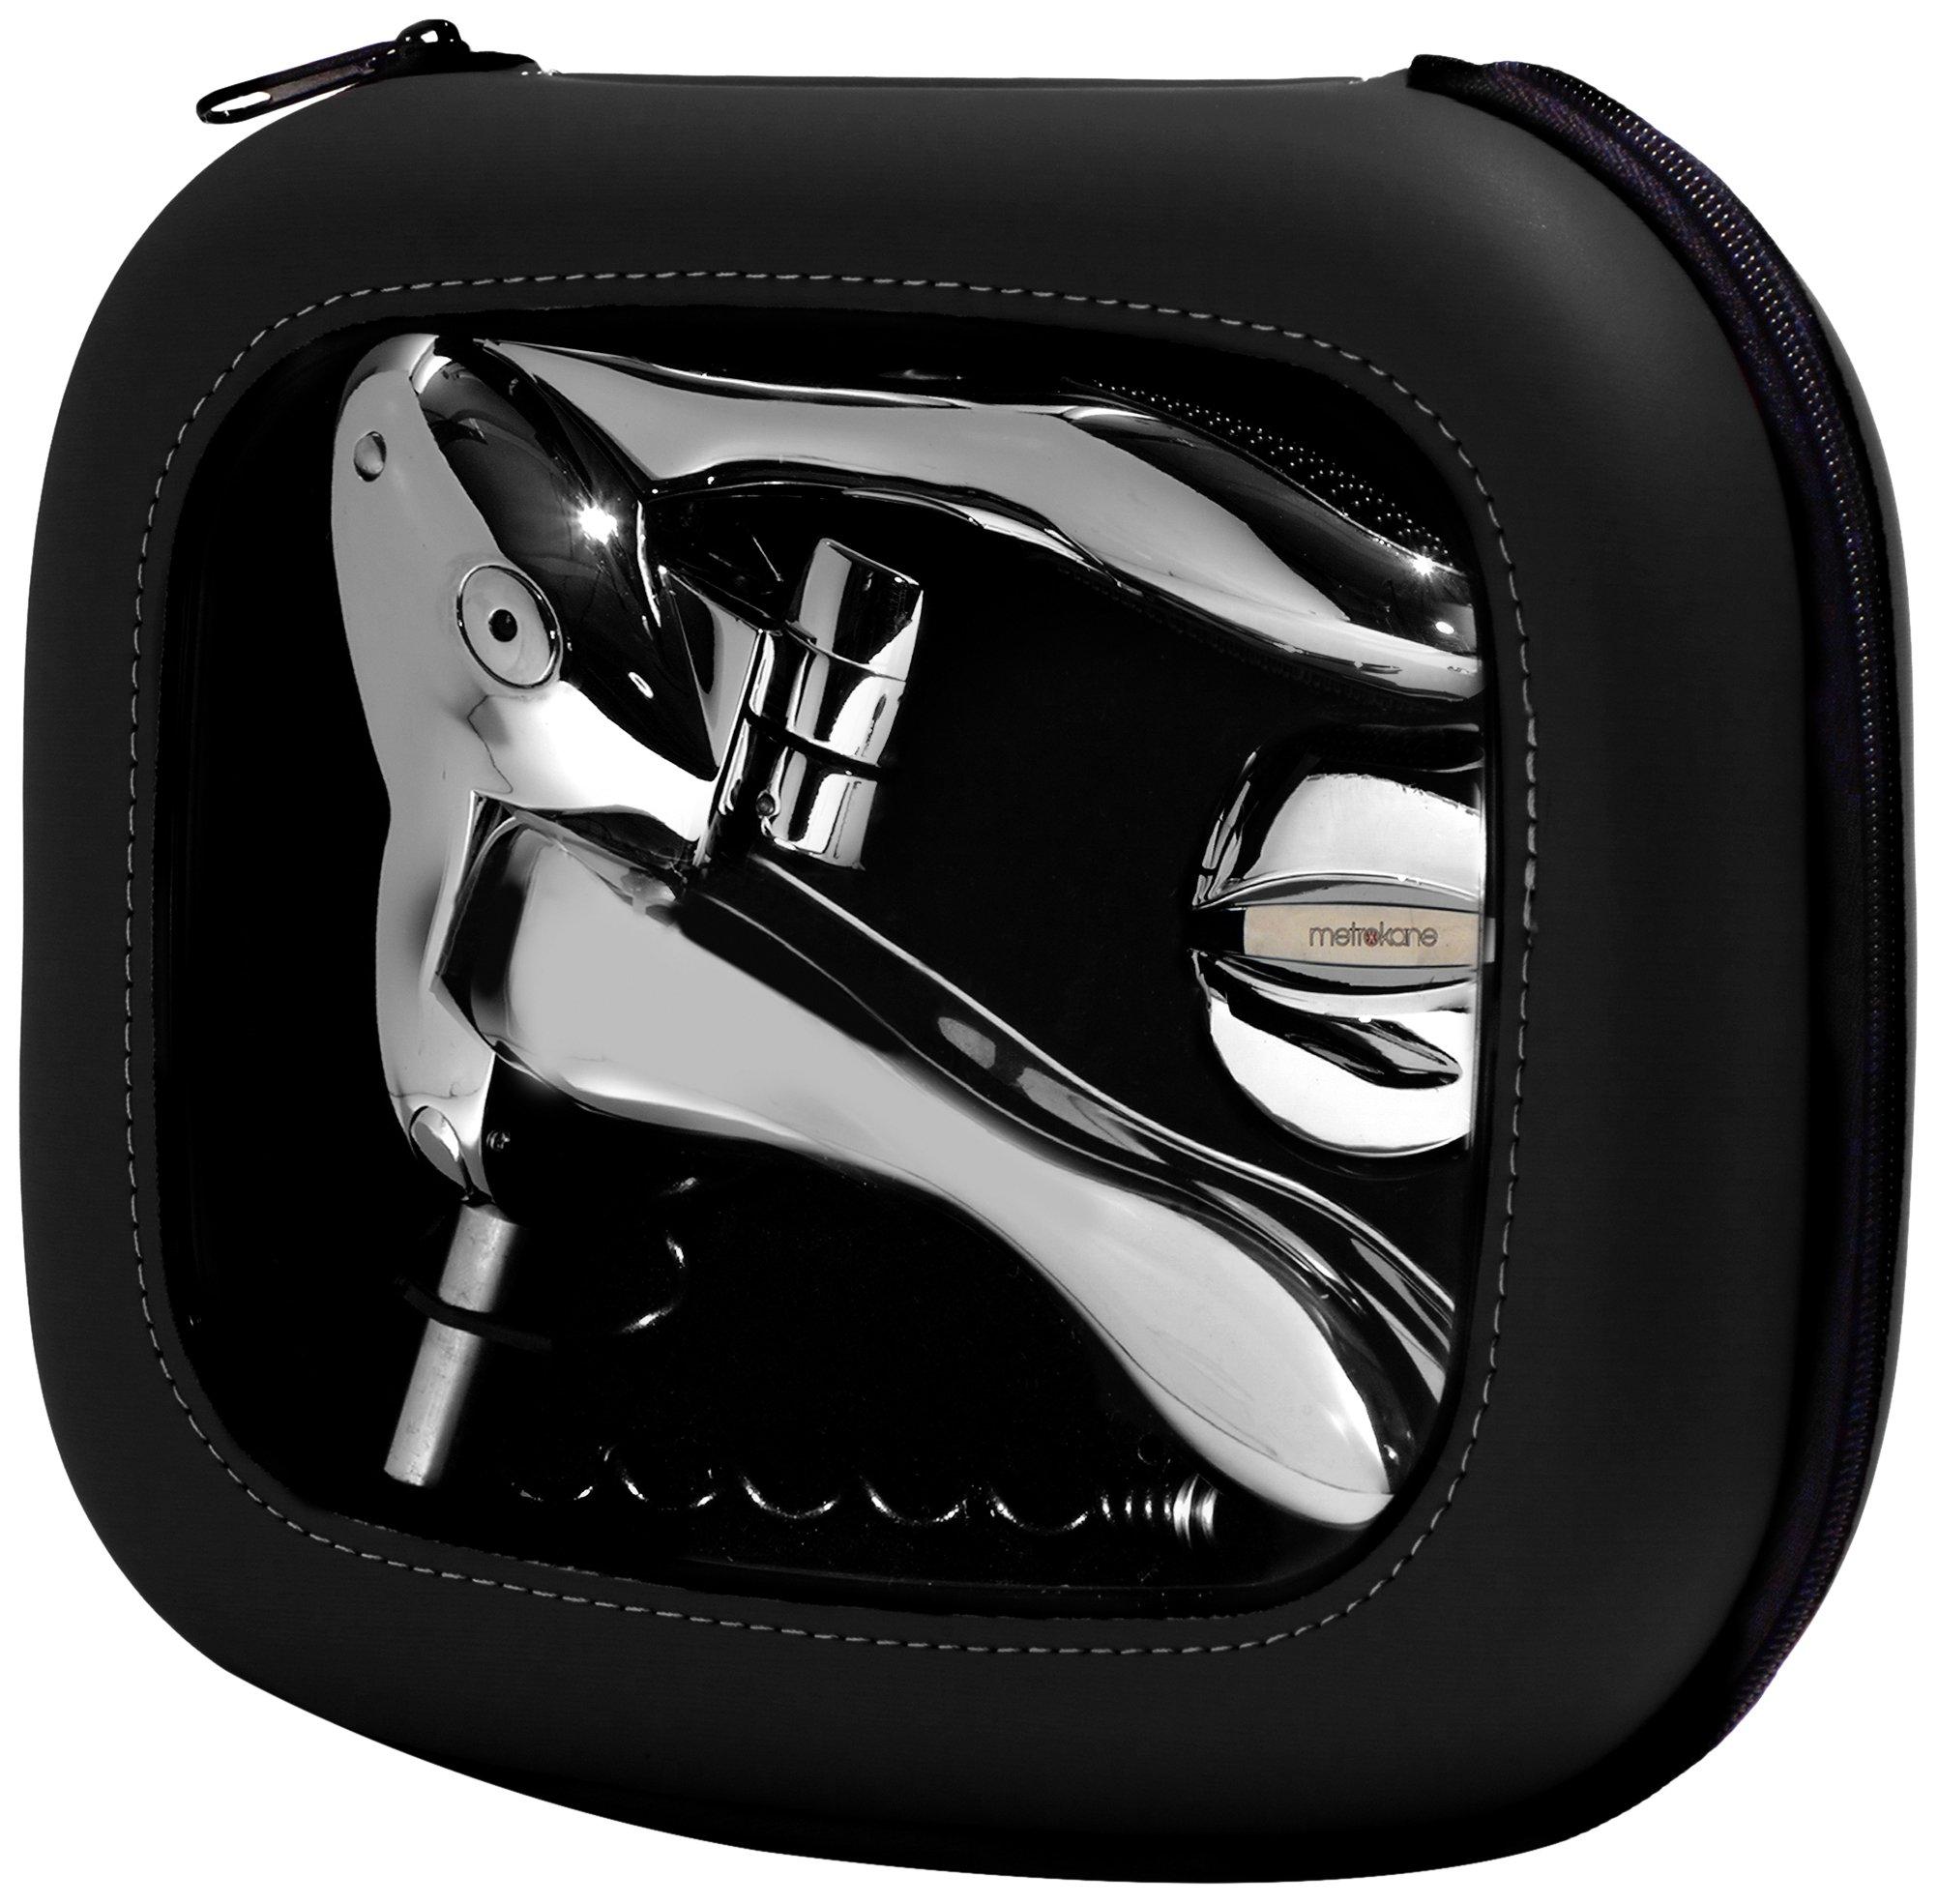 Rabbit Zippity Polished Sterling Corkscrew in EVA Storage Case (Black)